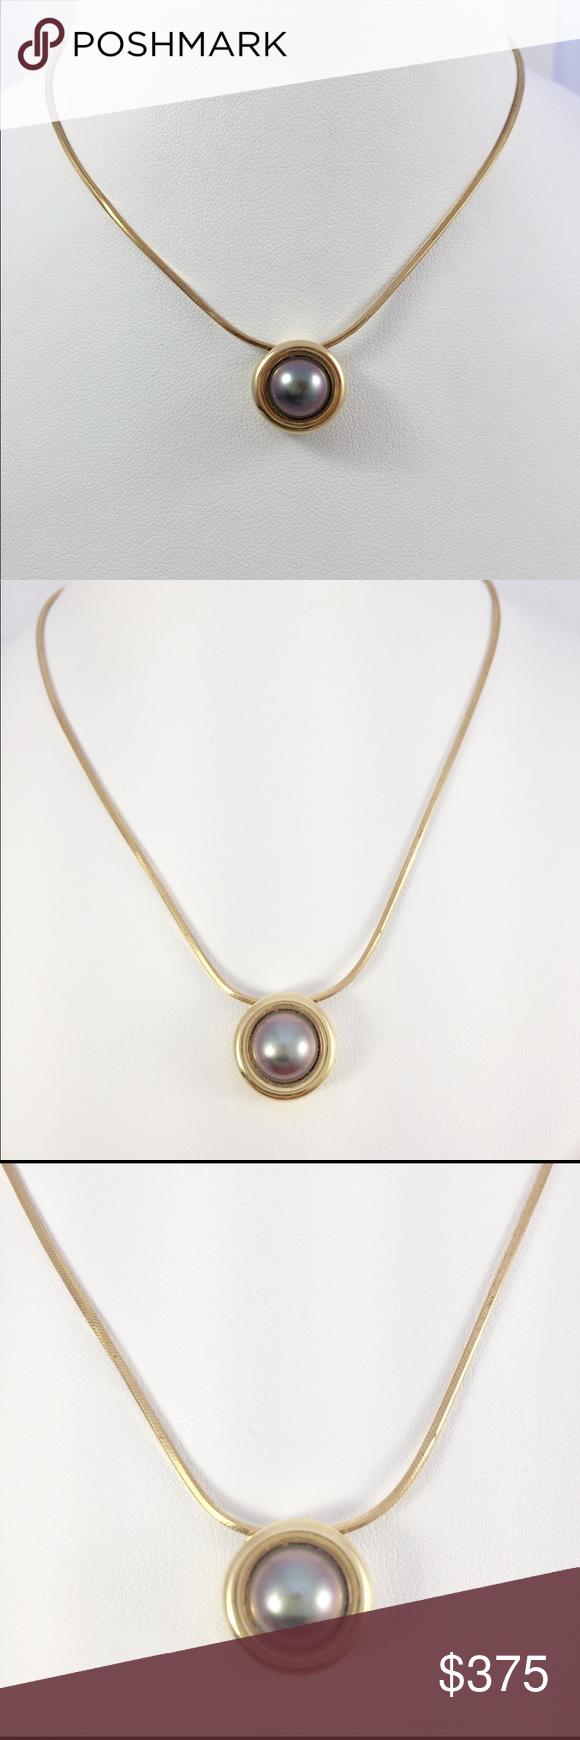 Nwt kt yg necklace heavy tahitian pearl pendant nwt tahitian